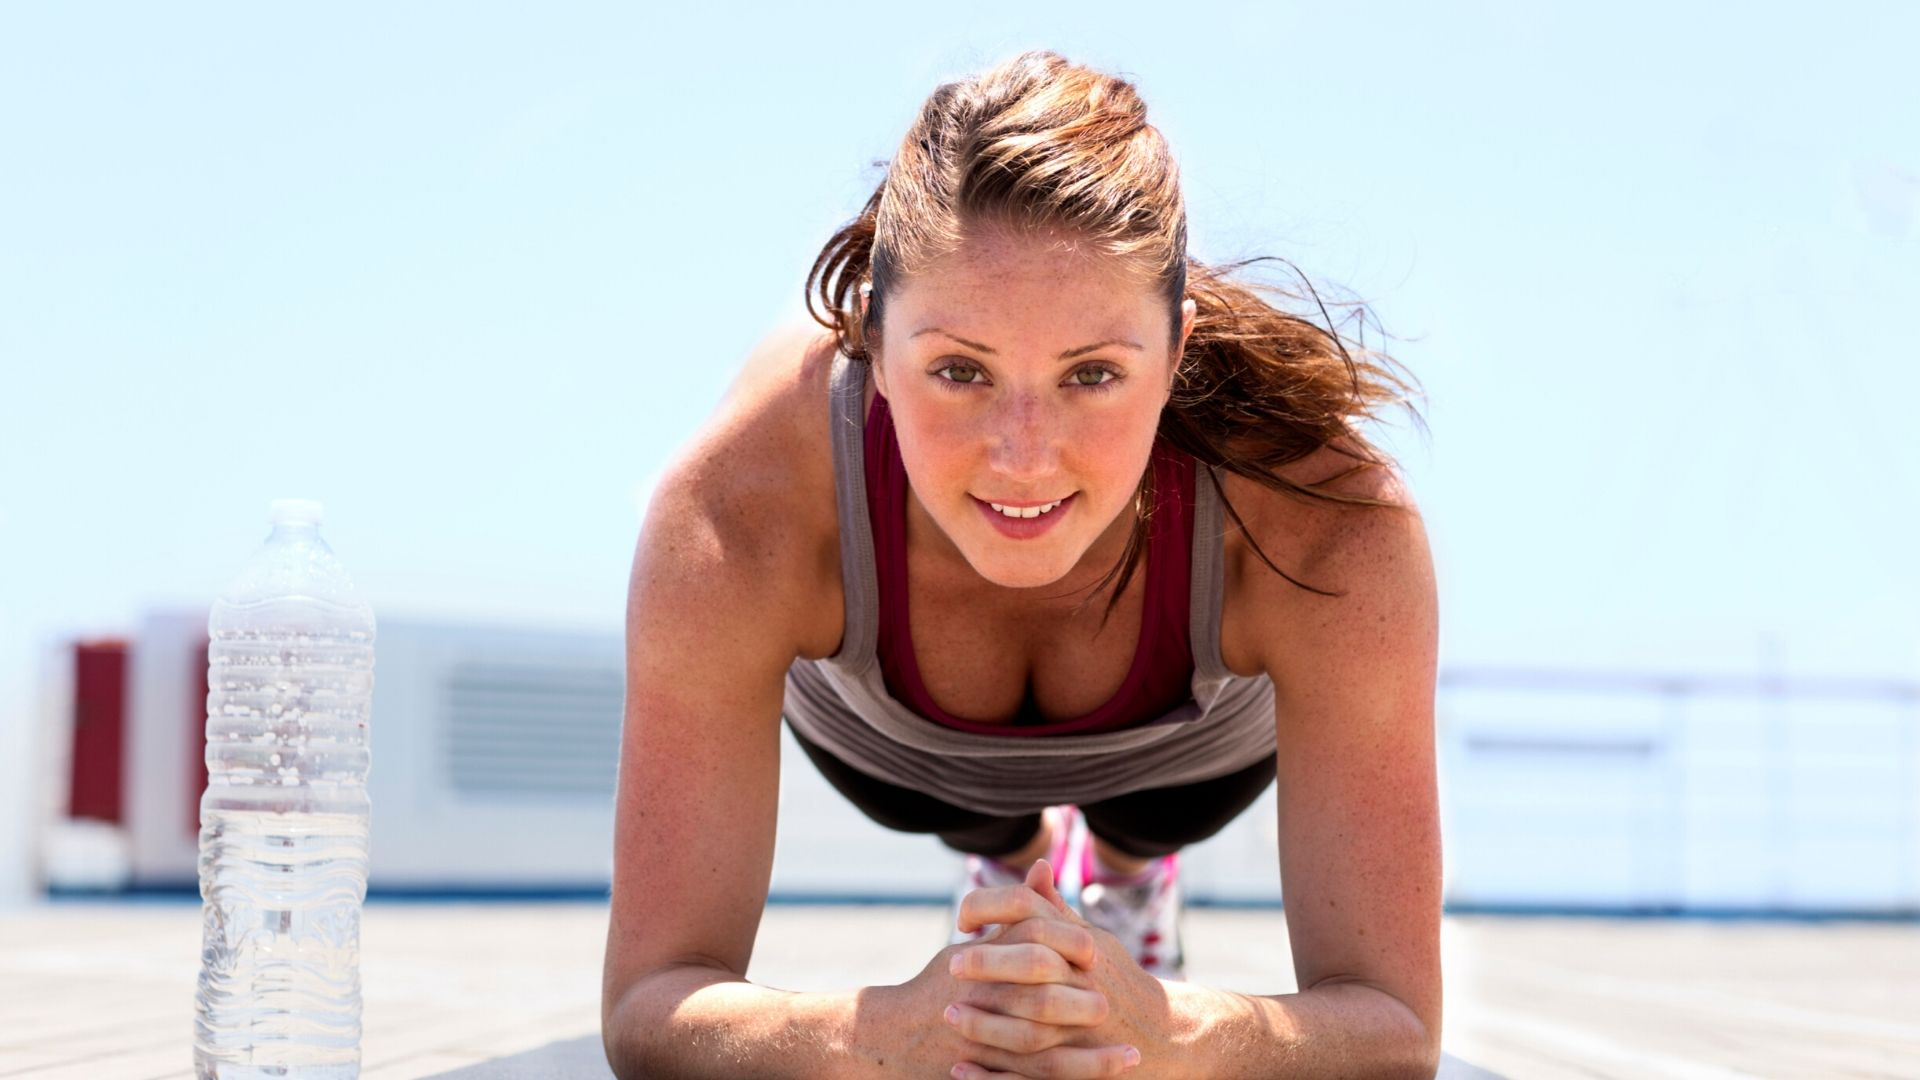 Plank Exercise Challenge